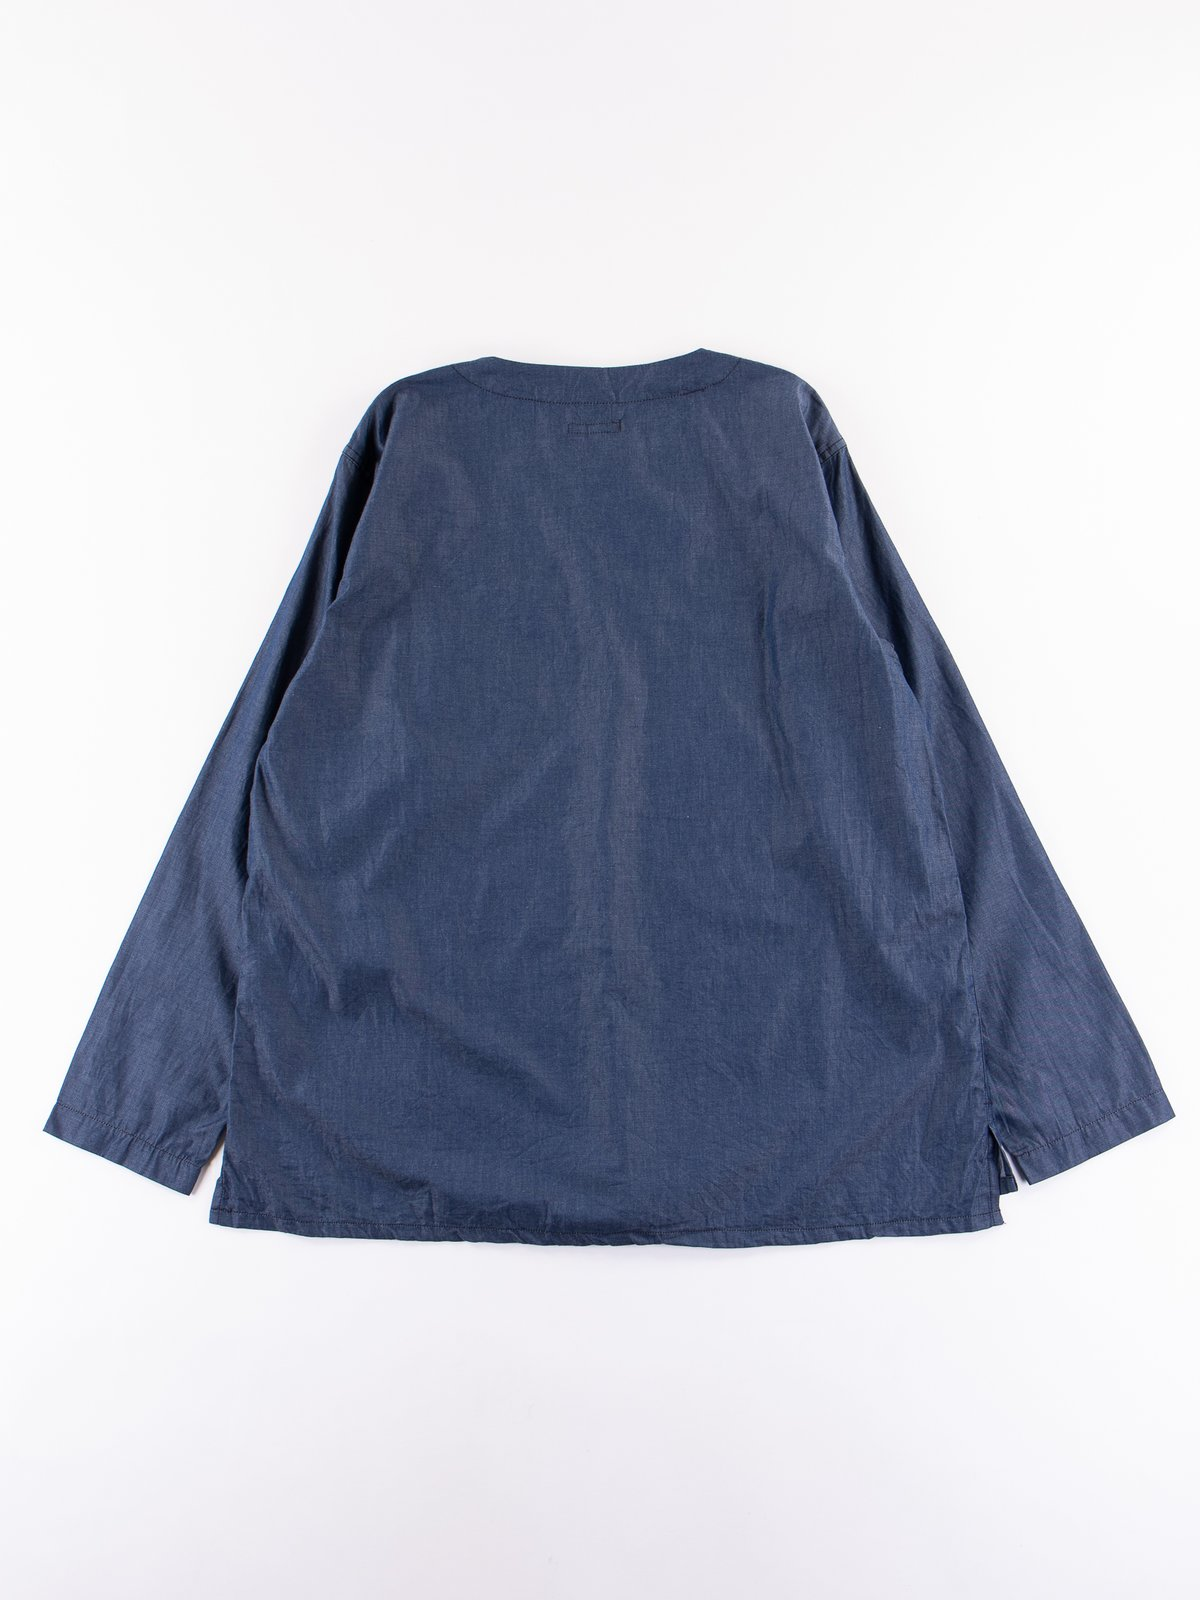 Navy Light Weight Denim MED Shirt - Image 5